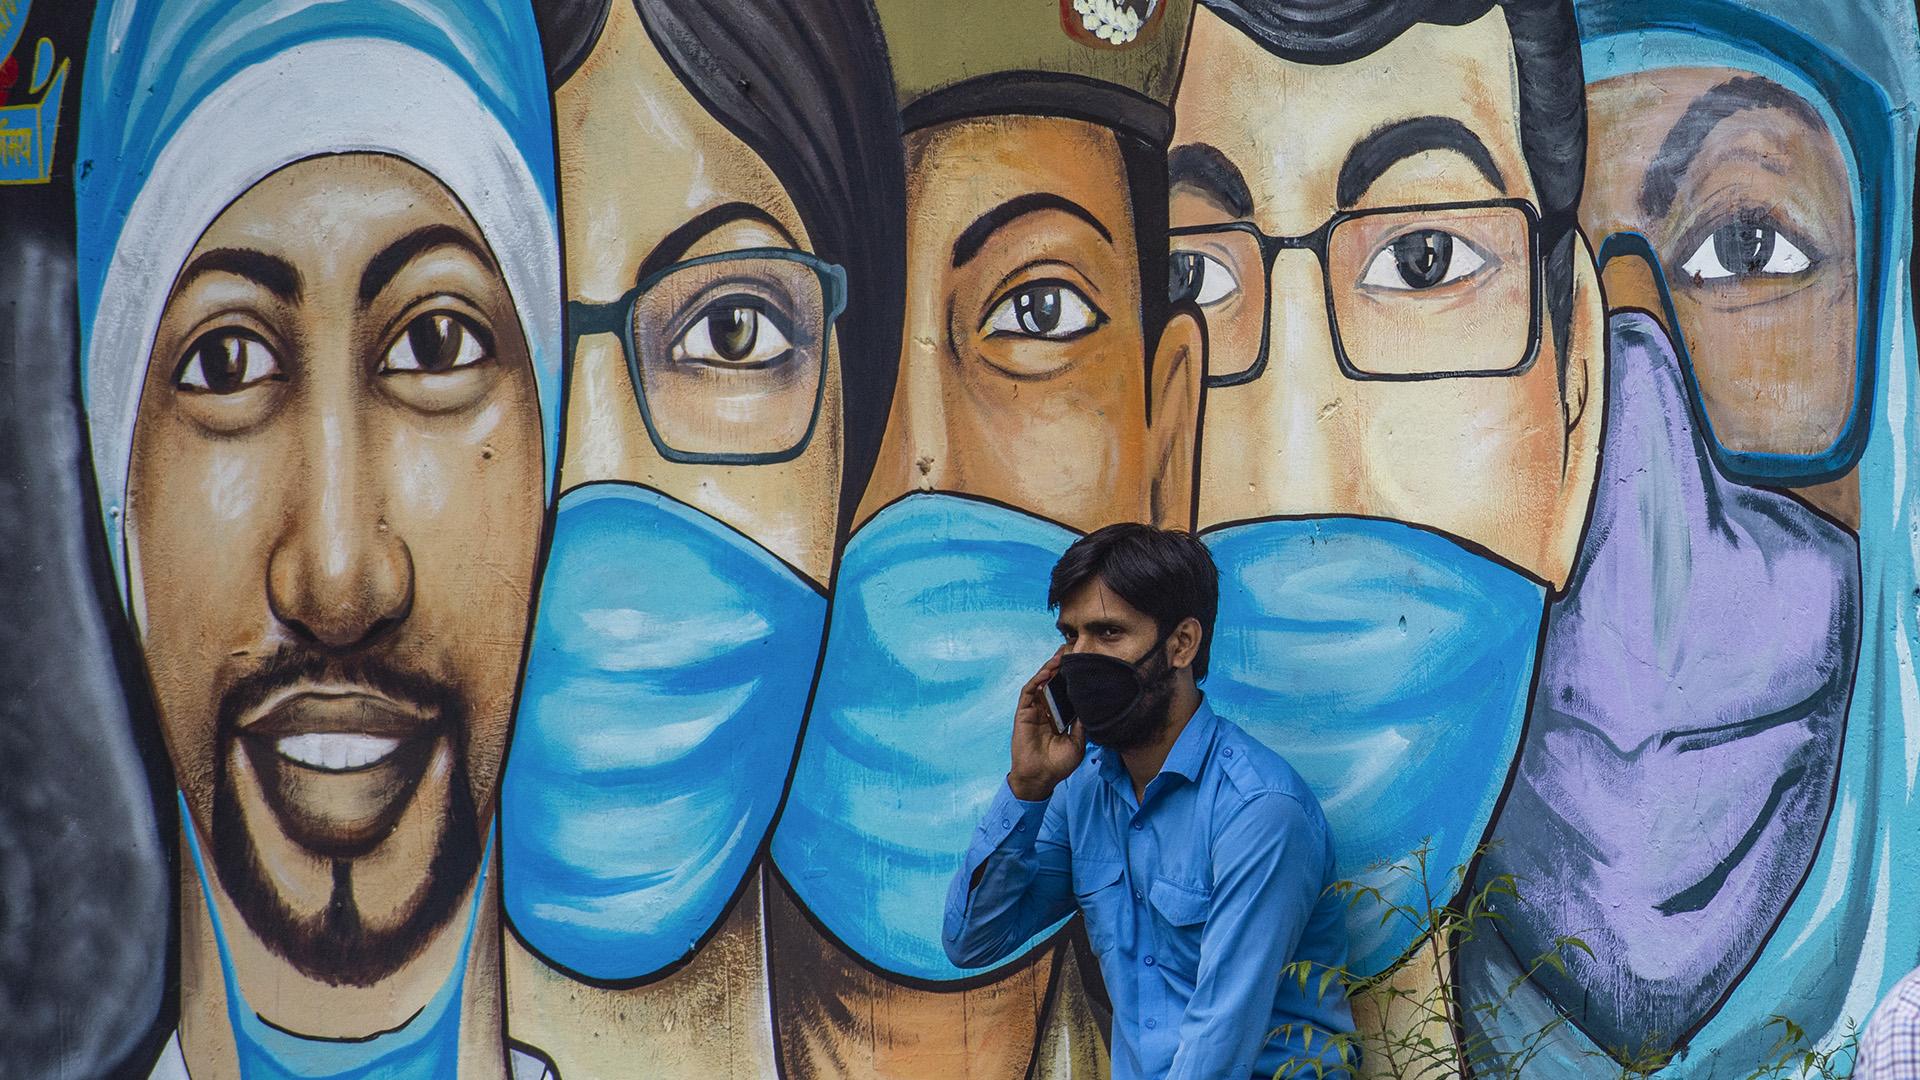 Non-profit Group Takes Amazon India To Court Over Fake Medical-grade Masks